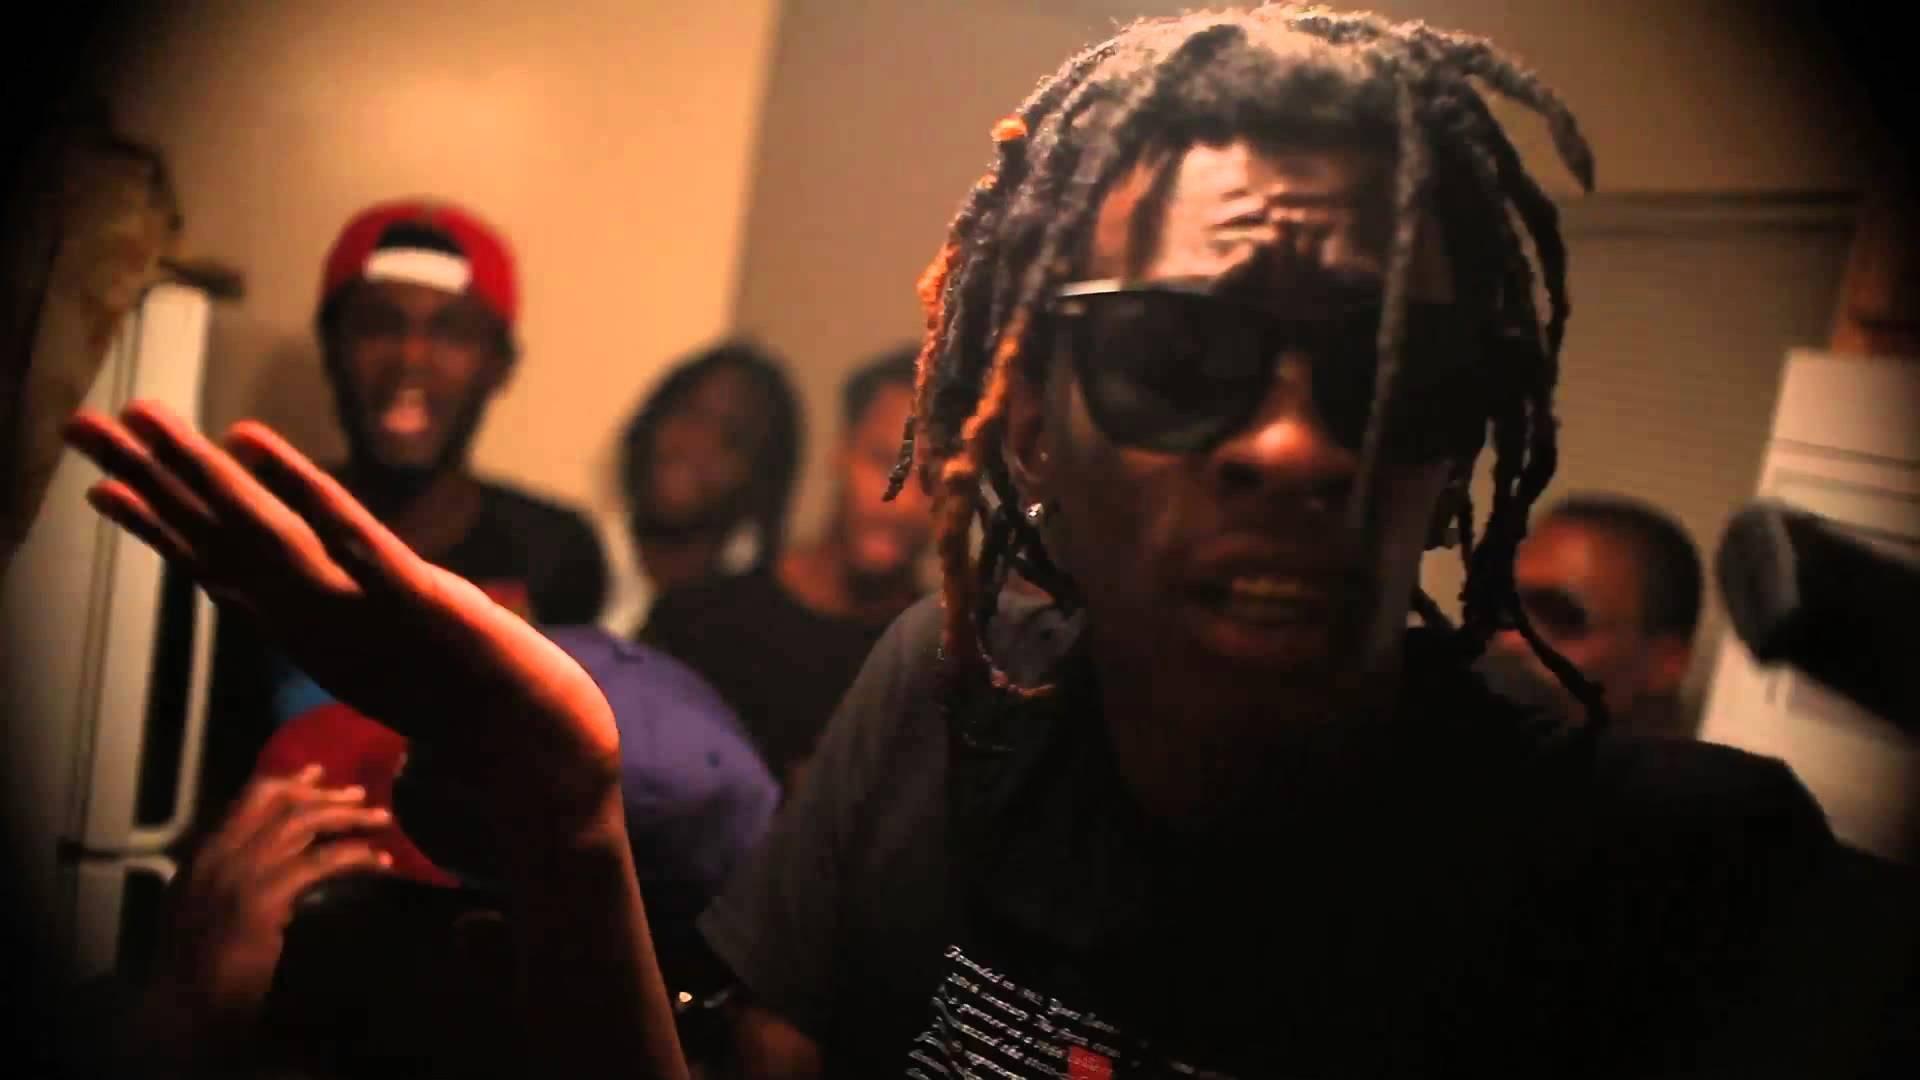 YOUNG THUG gangsta rapper rap hip hop 1ythug wallpaper 1920x1080